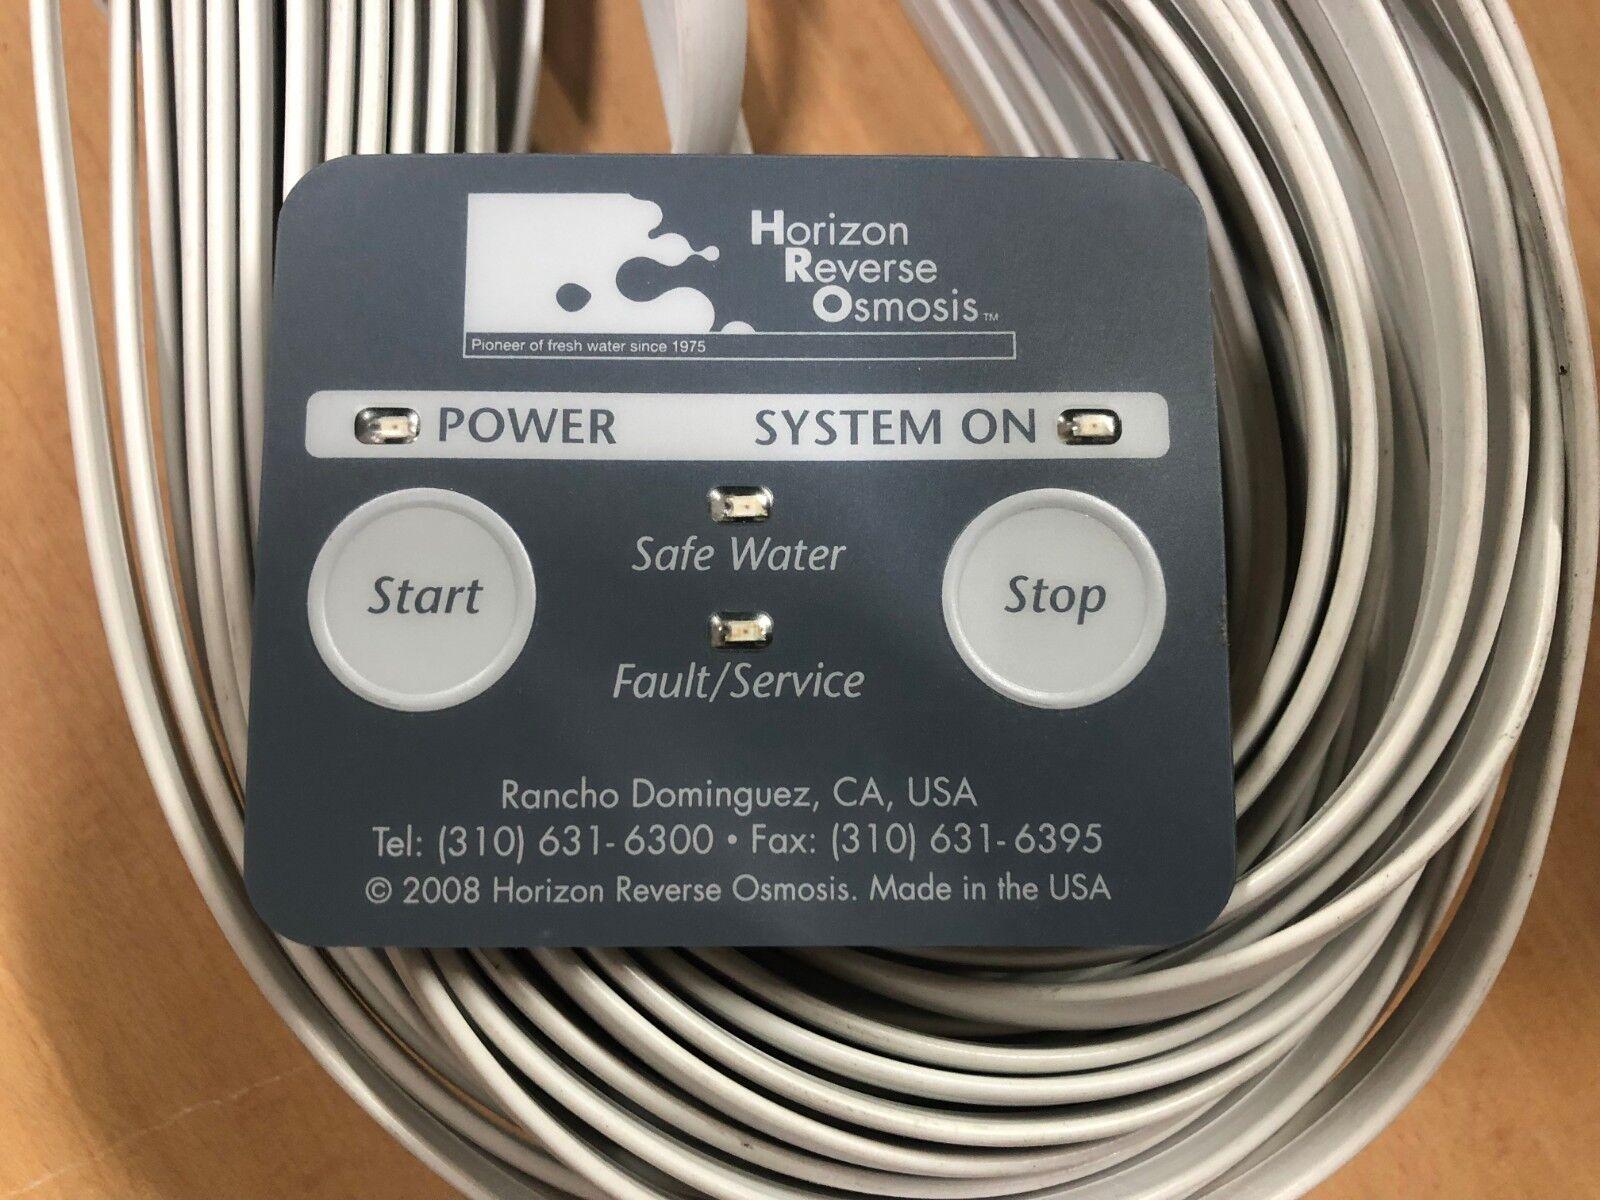 Horizon Reverse Osmosis (HRO) Seafari Compact Remote Control - H2606210005